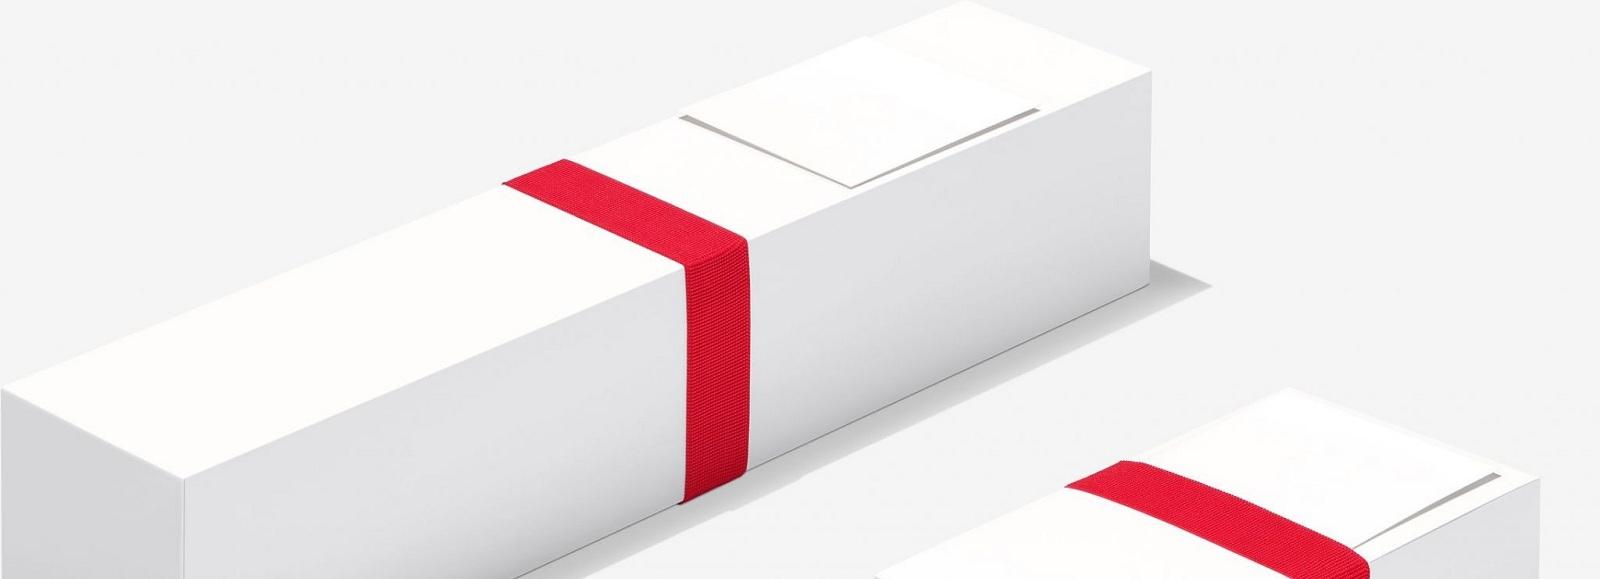 BOXANDART-BOX-AND-ART-PACKAGE-BOXES-κουτιά πολυτελείας, κουτια πολυτελειας, χαρτινα κουτια πολυτελειας, κουτια πολυτελειας